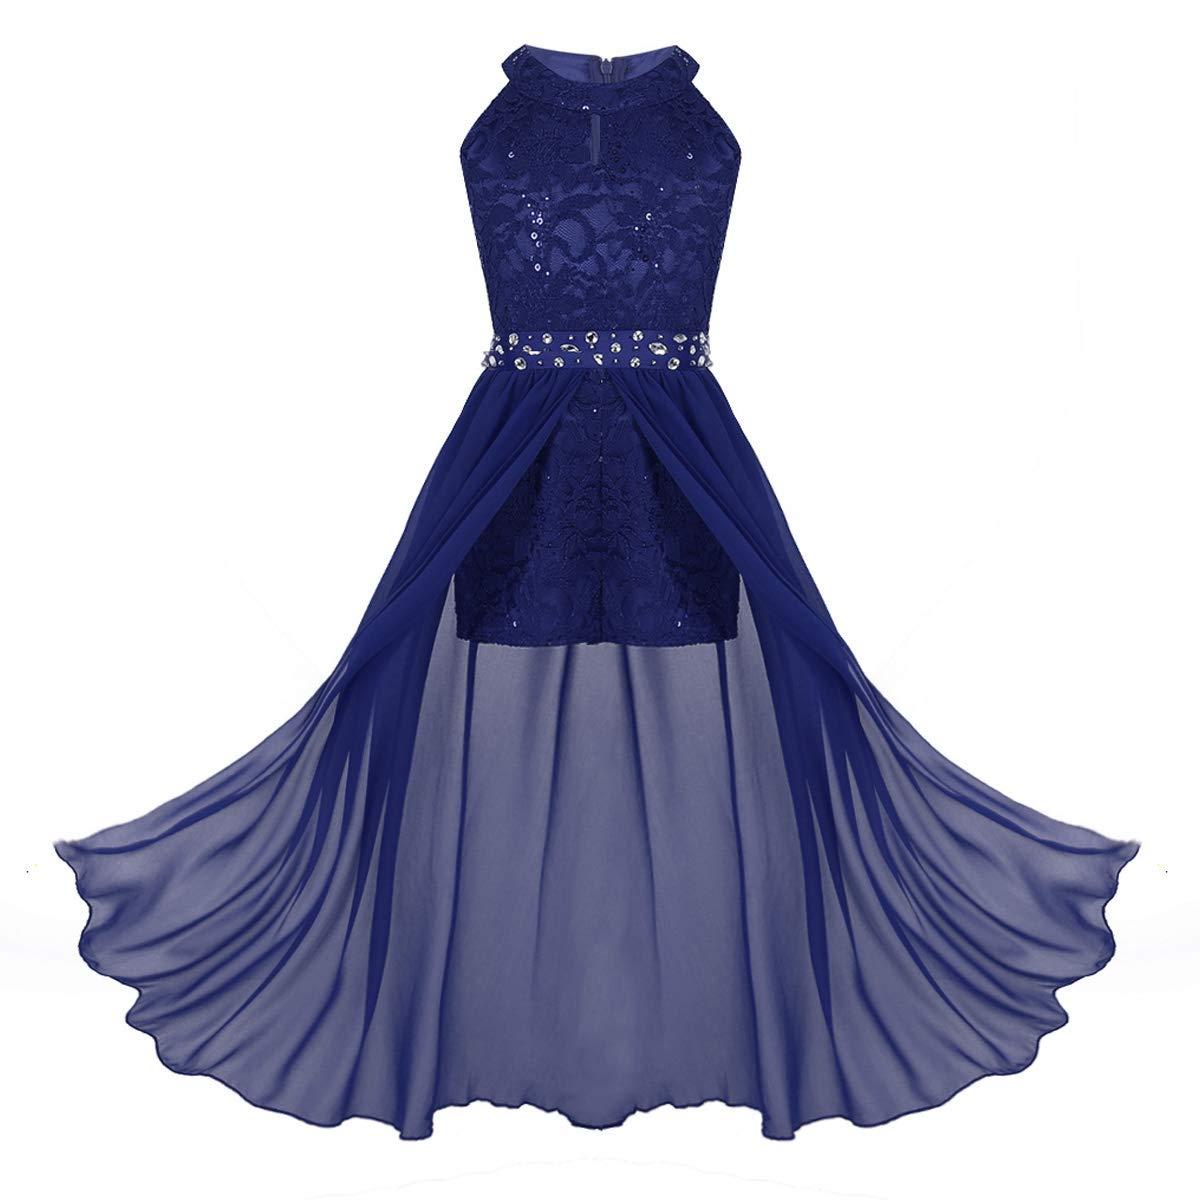 Freebily Junior Girls Sleeveless Halter-Neck Shimmer Mesh Wedding Bridesmaid Party Prom Dress Dance Ball Gown